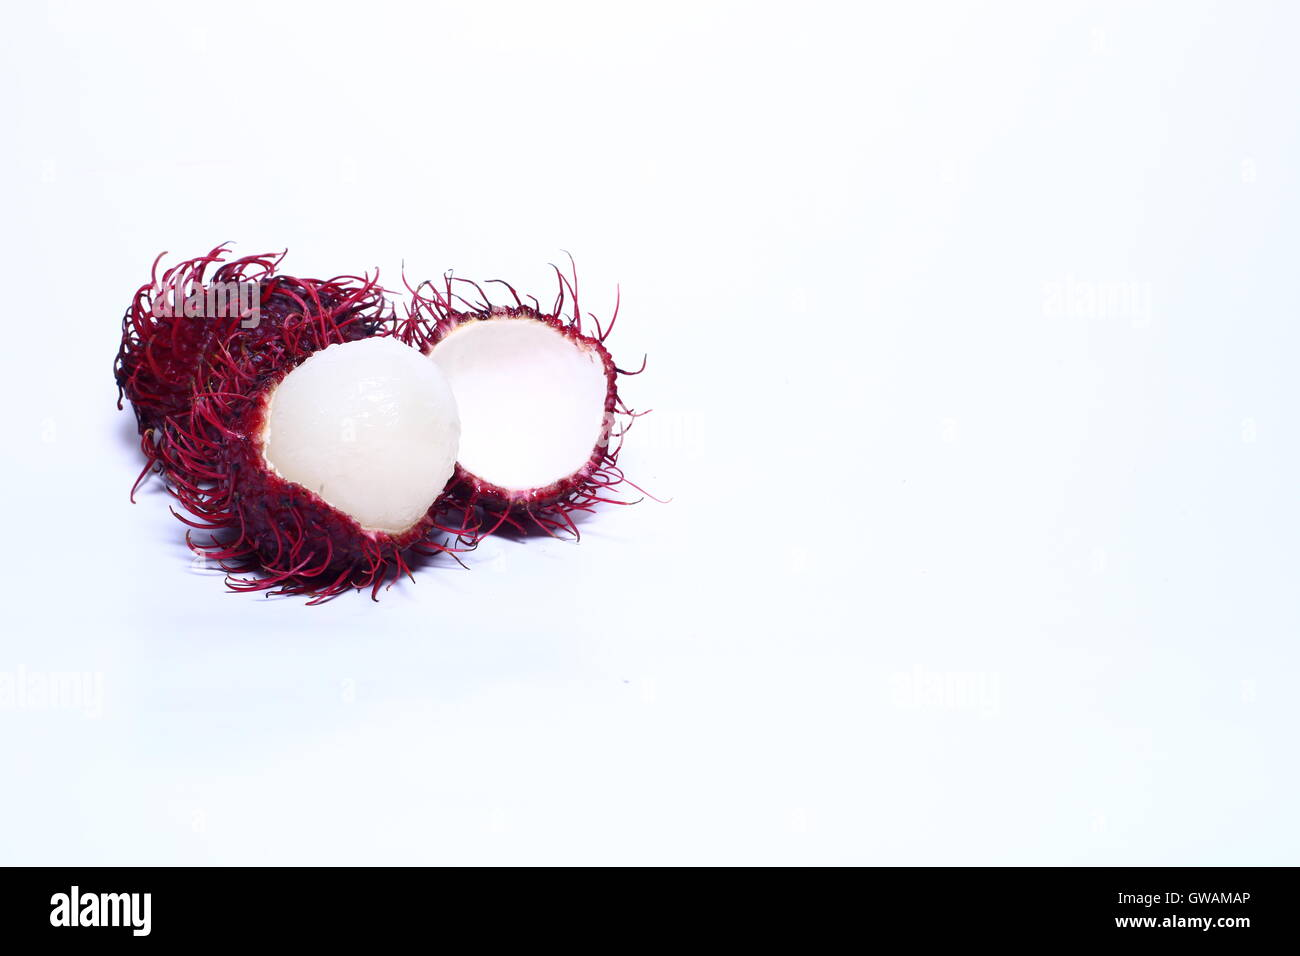 Open rambutan against a white background - Stock Image